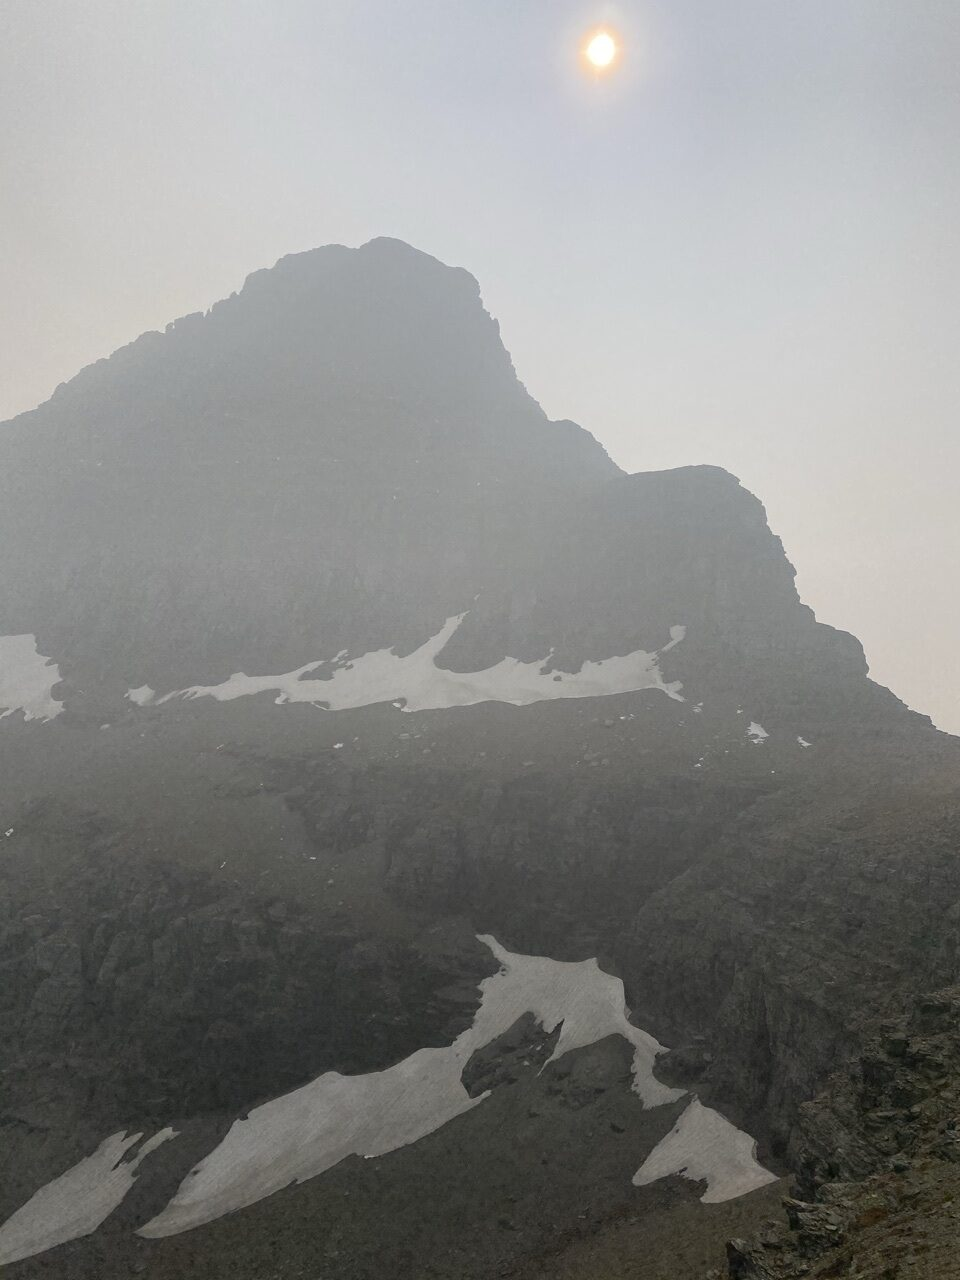 mountain in haze